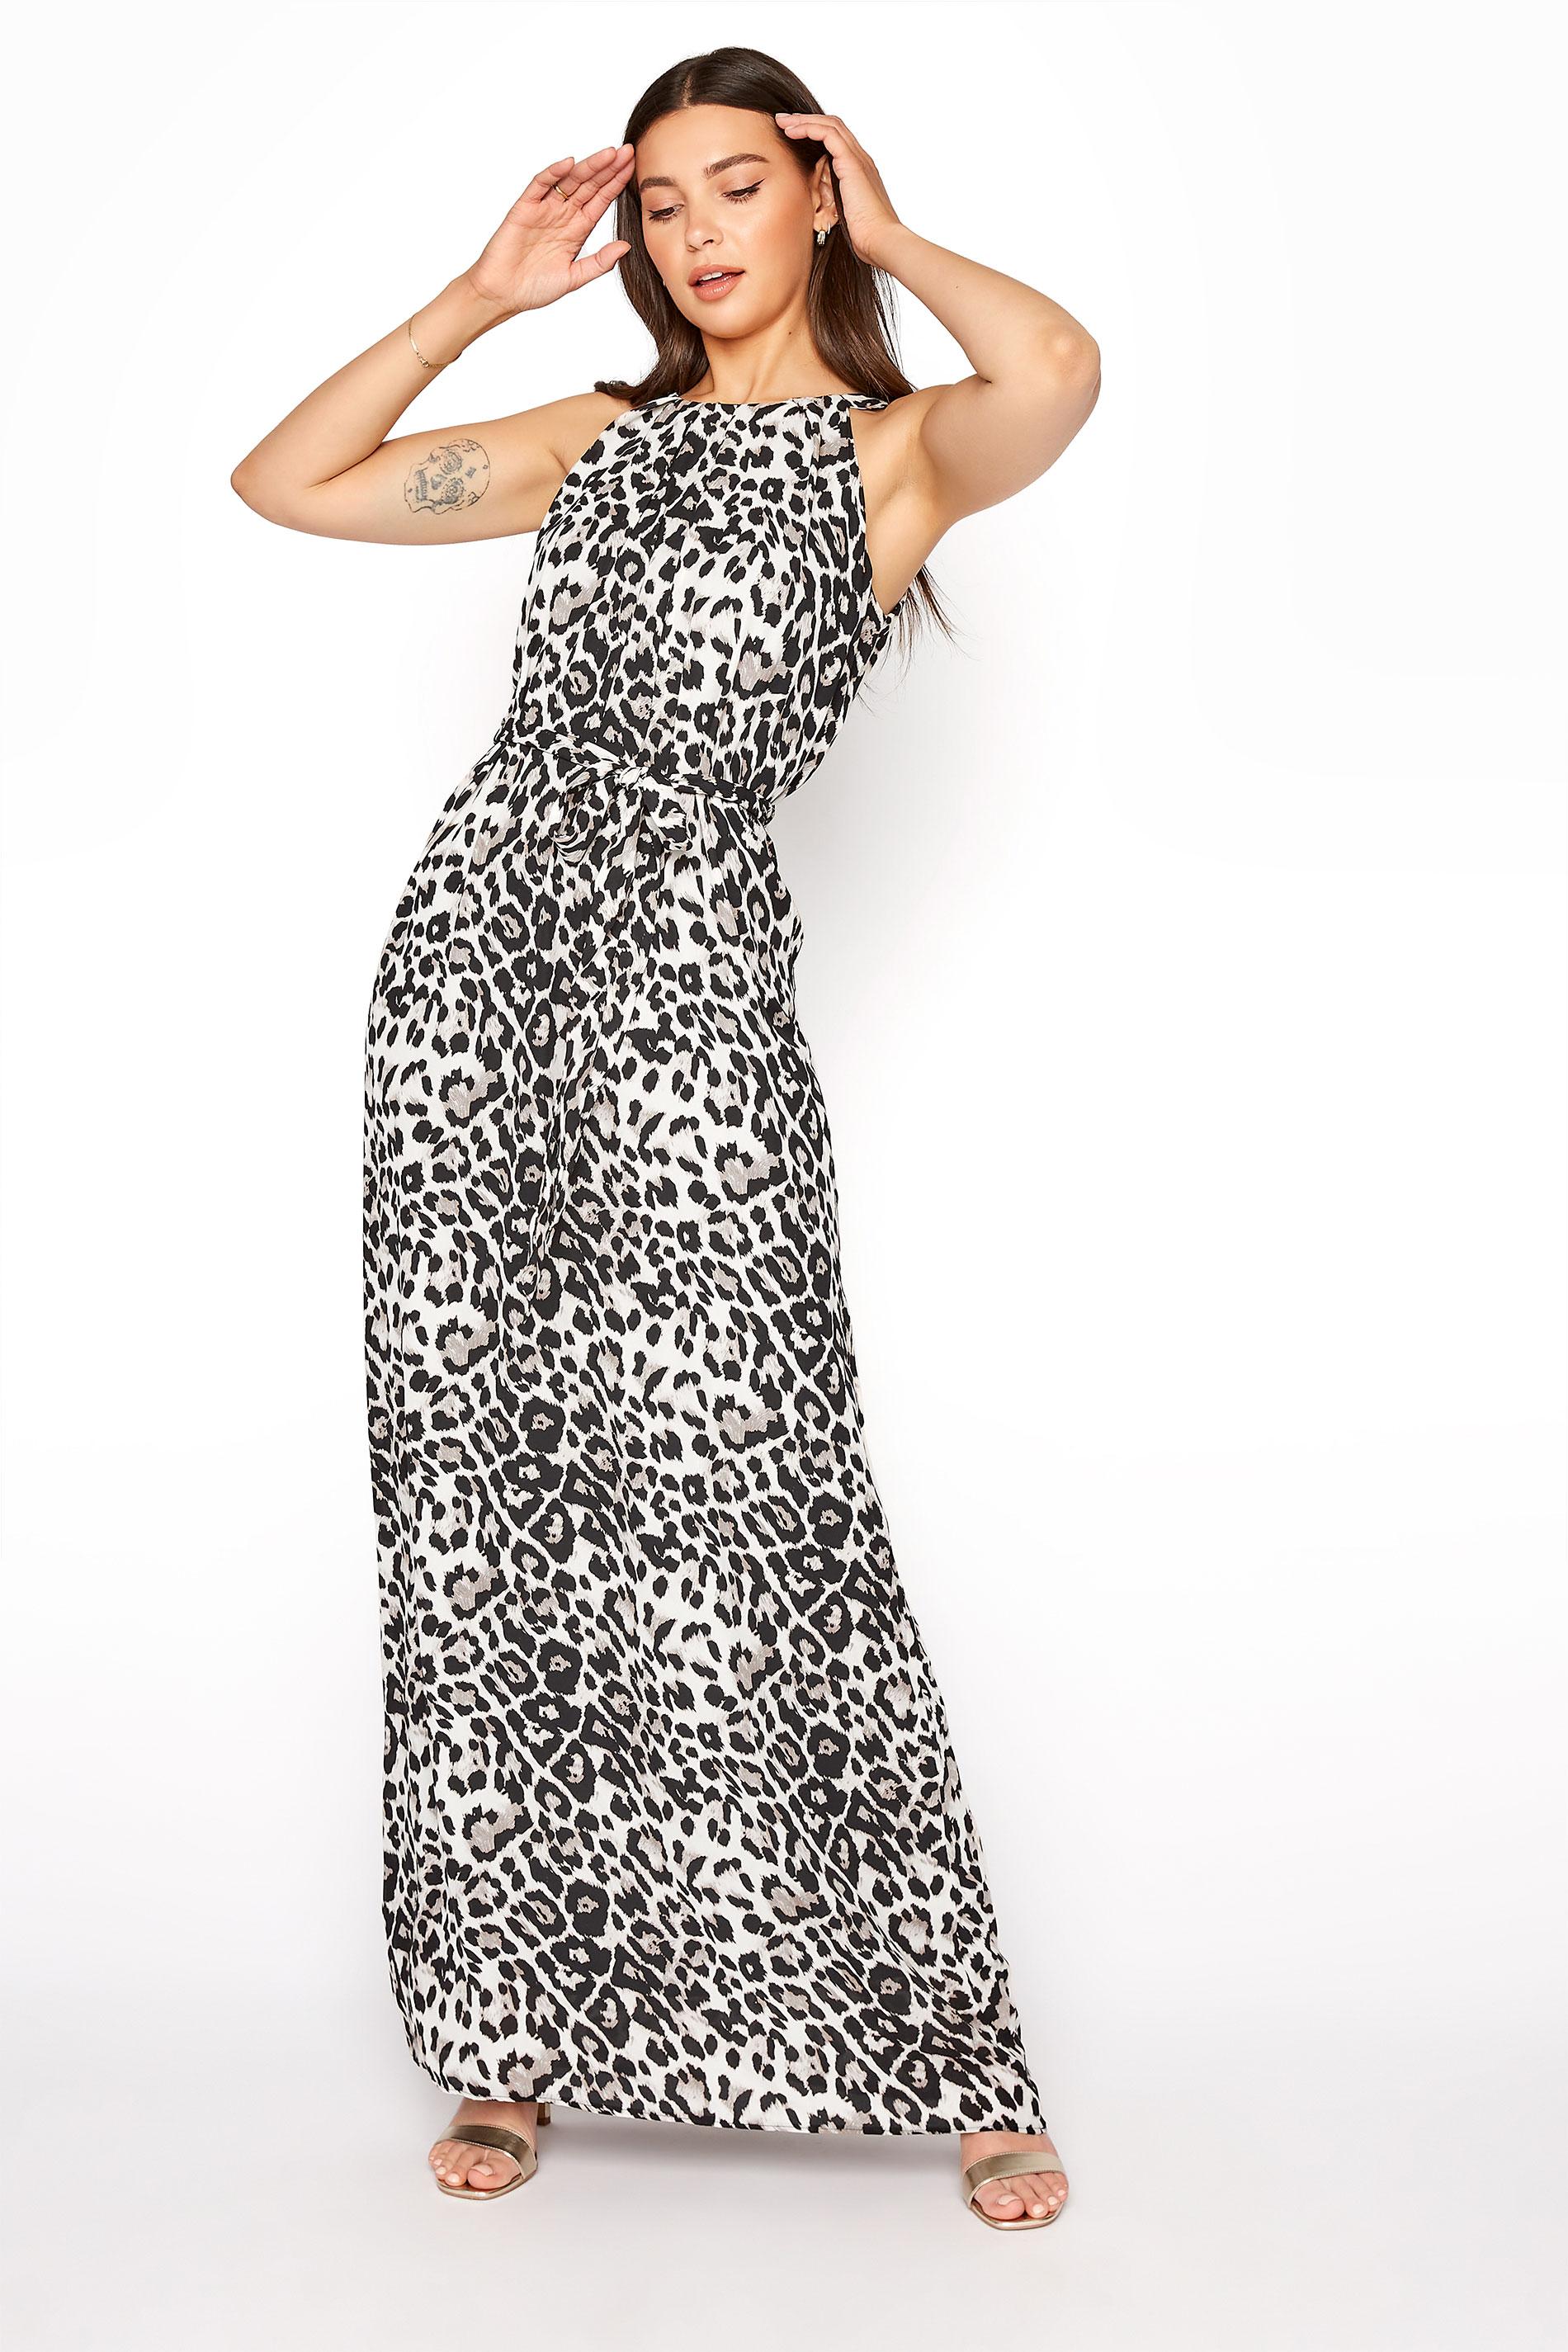 LTS Multi Leopard Print Halter Neck Maxi Dress